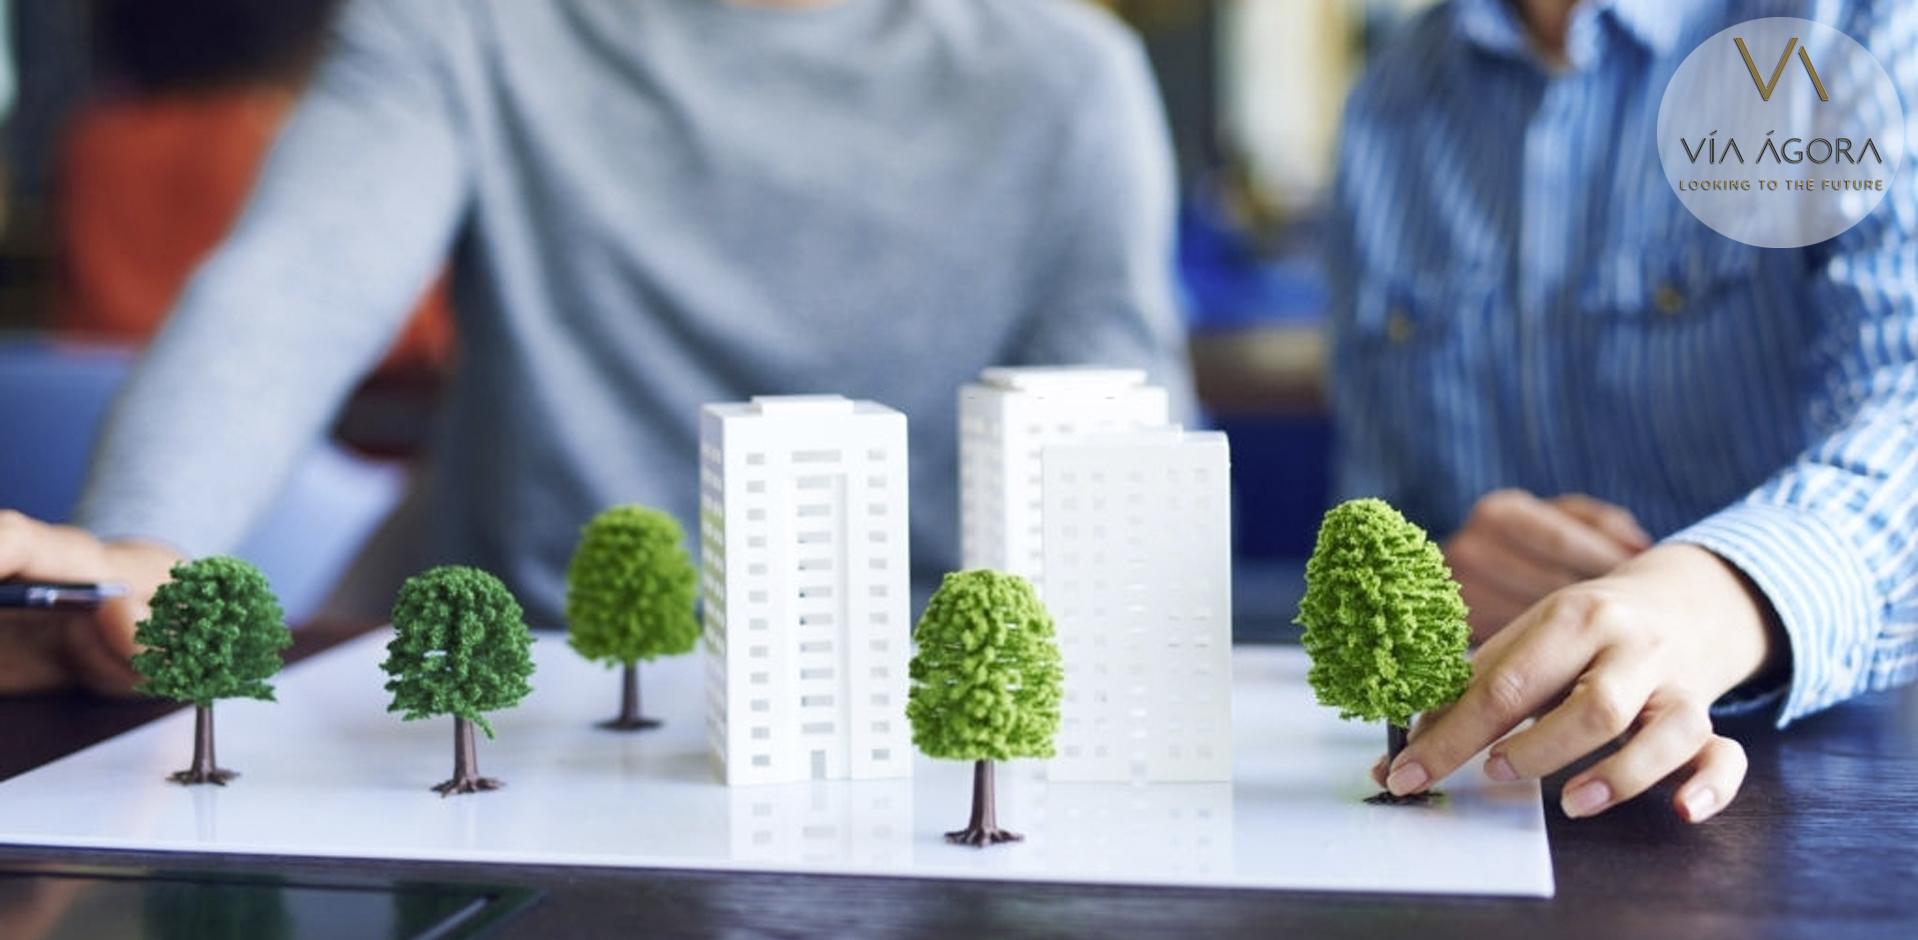 via agora - promotora inmobiliaria - sostenibilidad